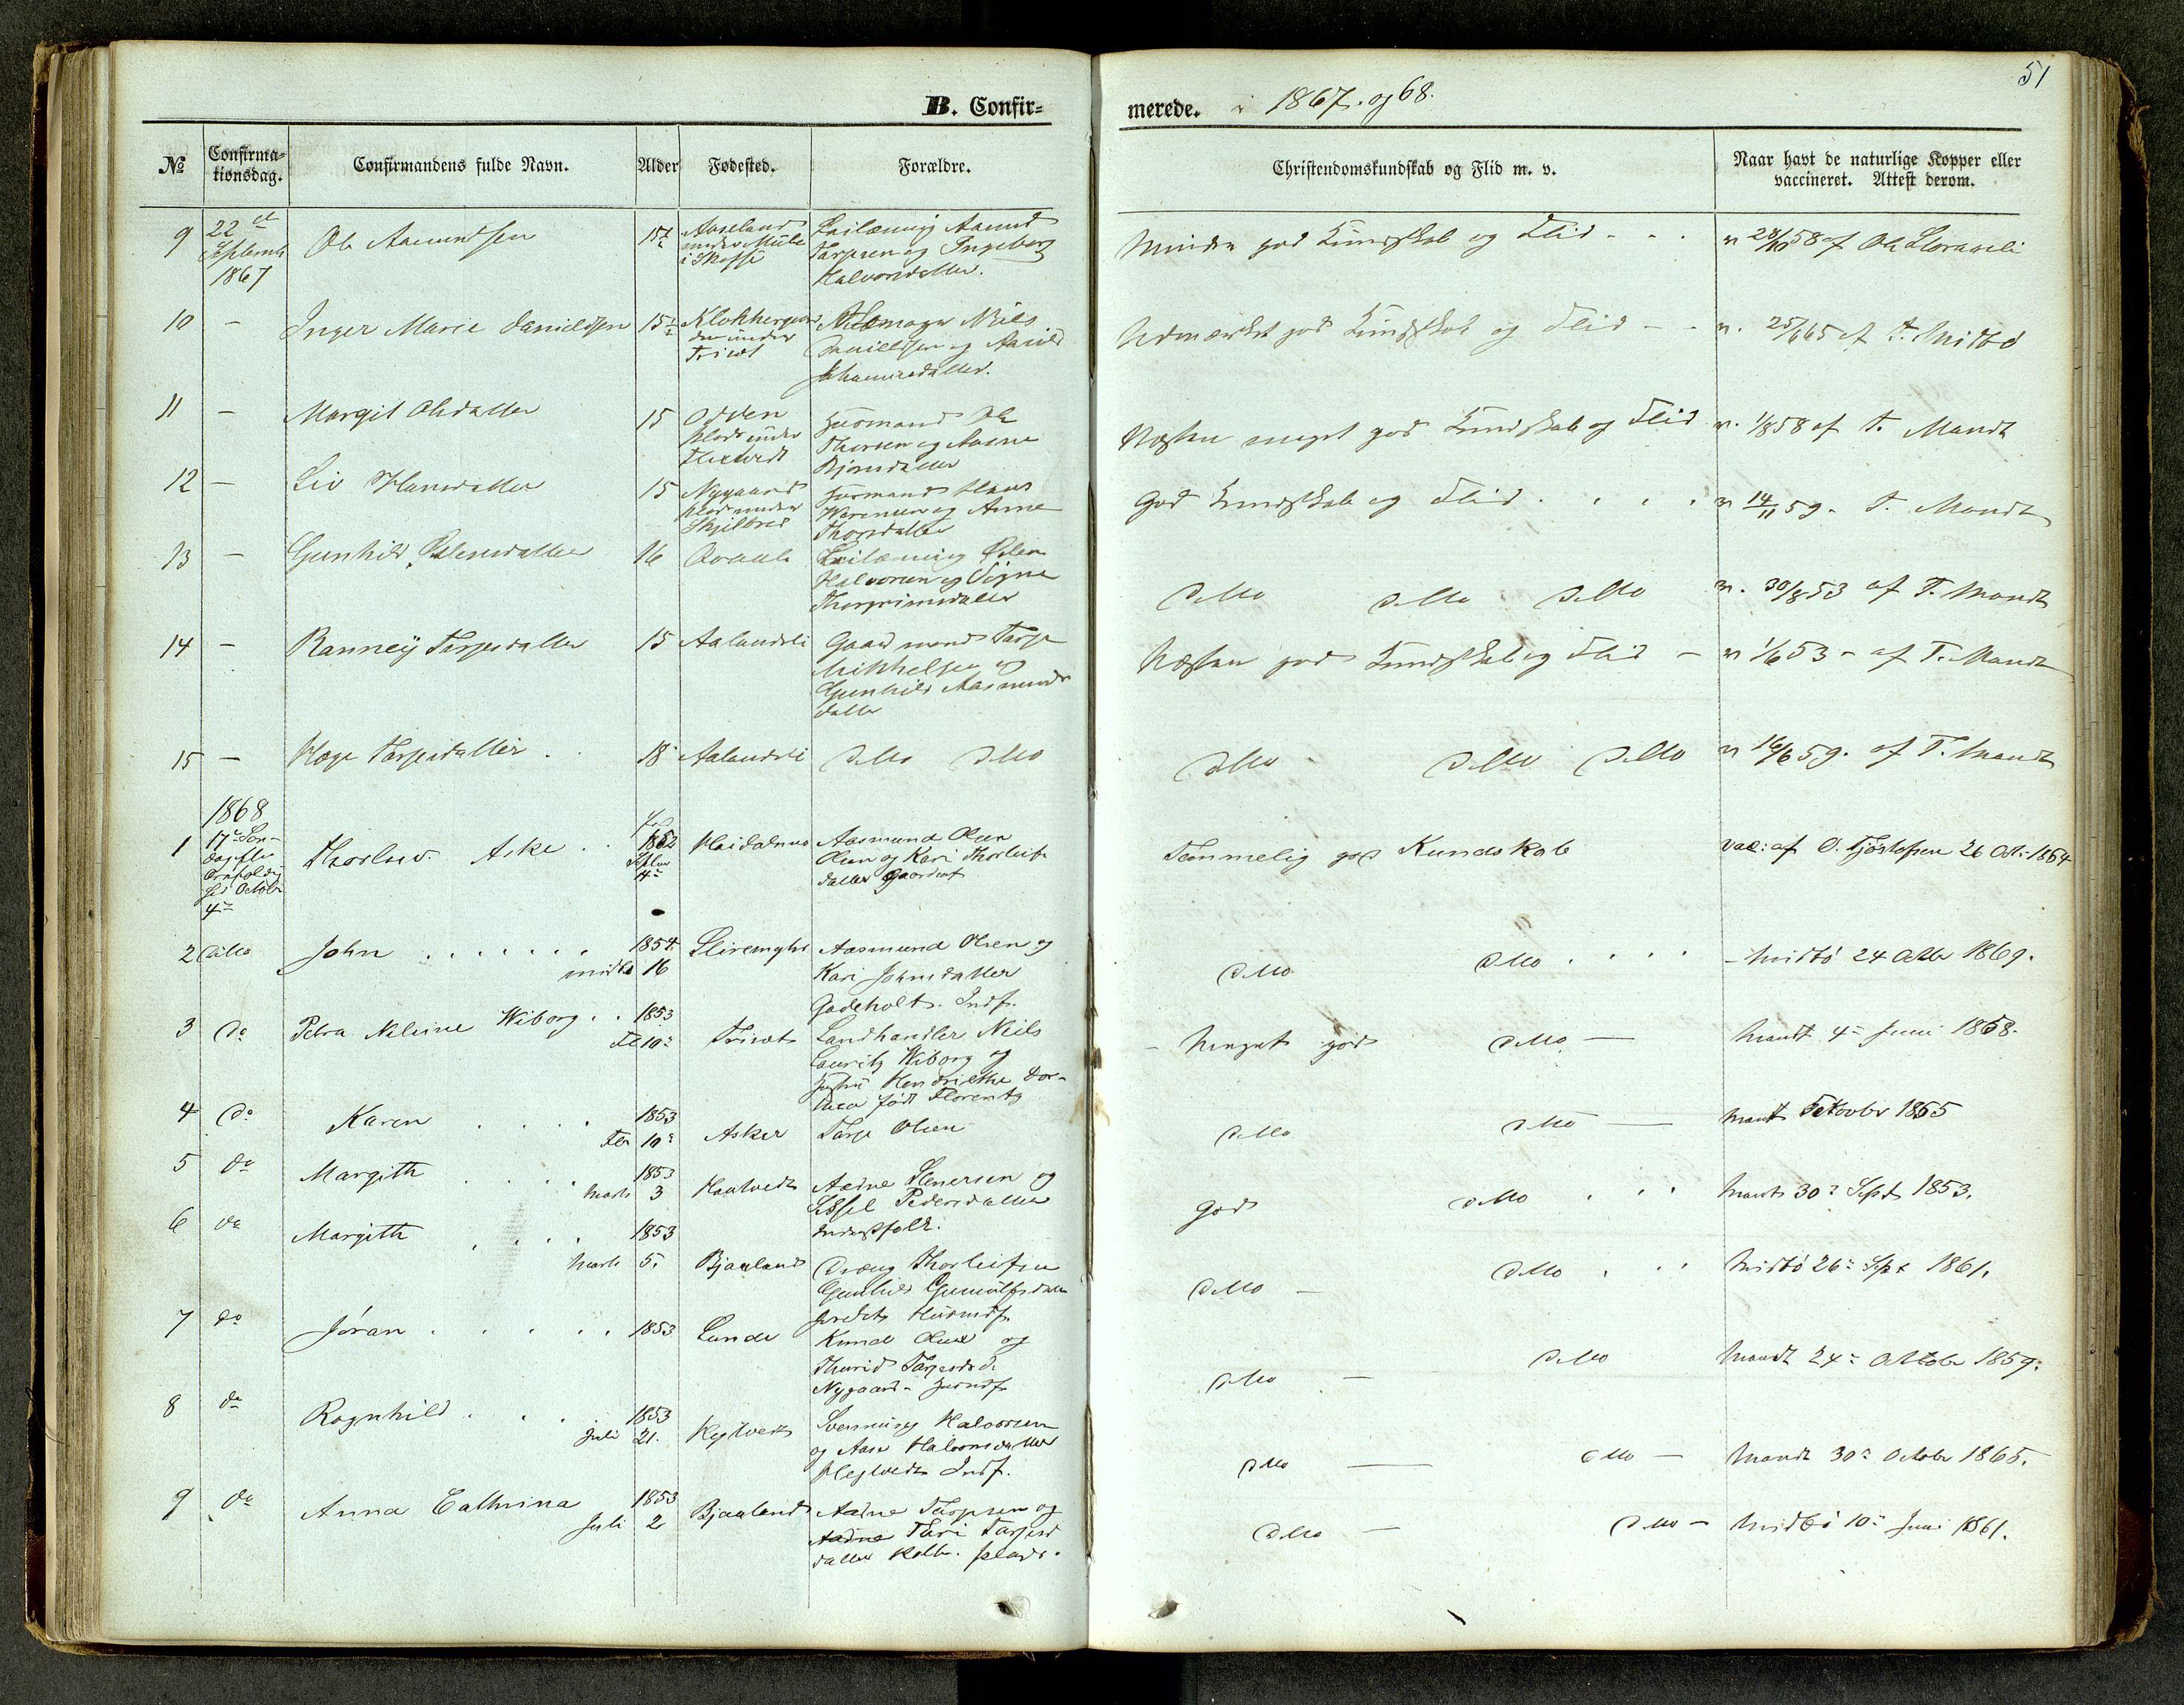 SAKO, Lårdal kirkebøker, G/Ga/L0002: Klokkerbok nr. I 2, 1861-1890, s. 51